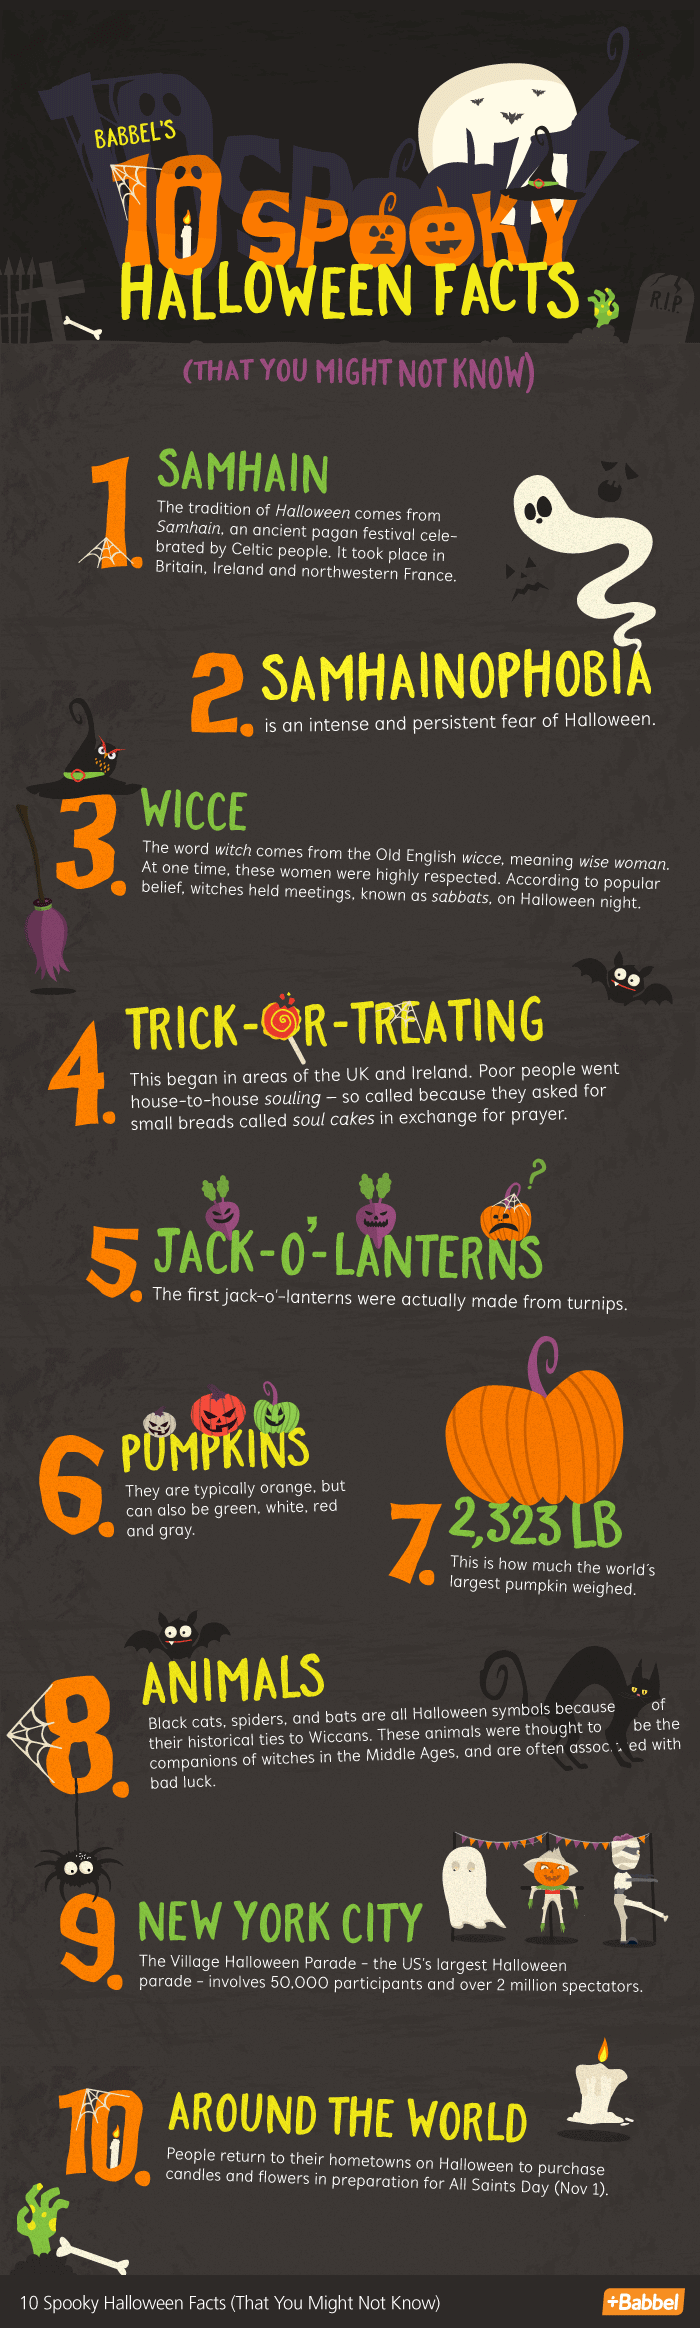 Halloween Facts, Facts About Halloween | GlendaleHalloween